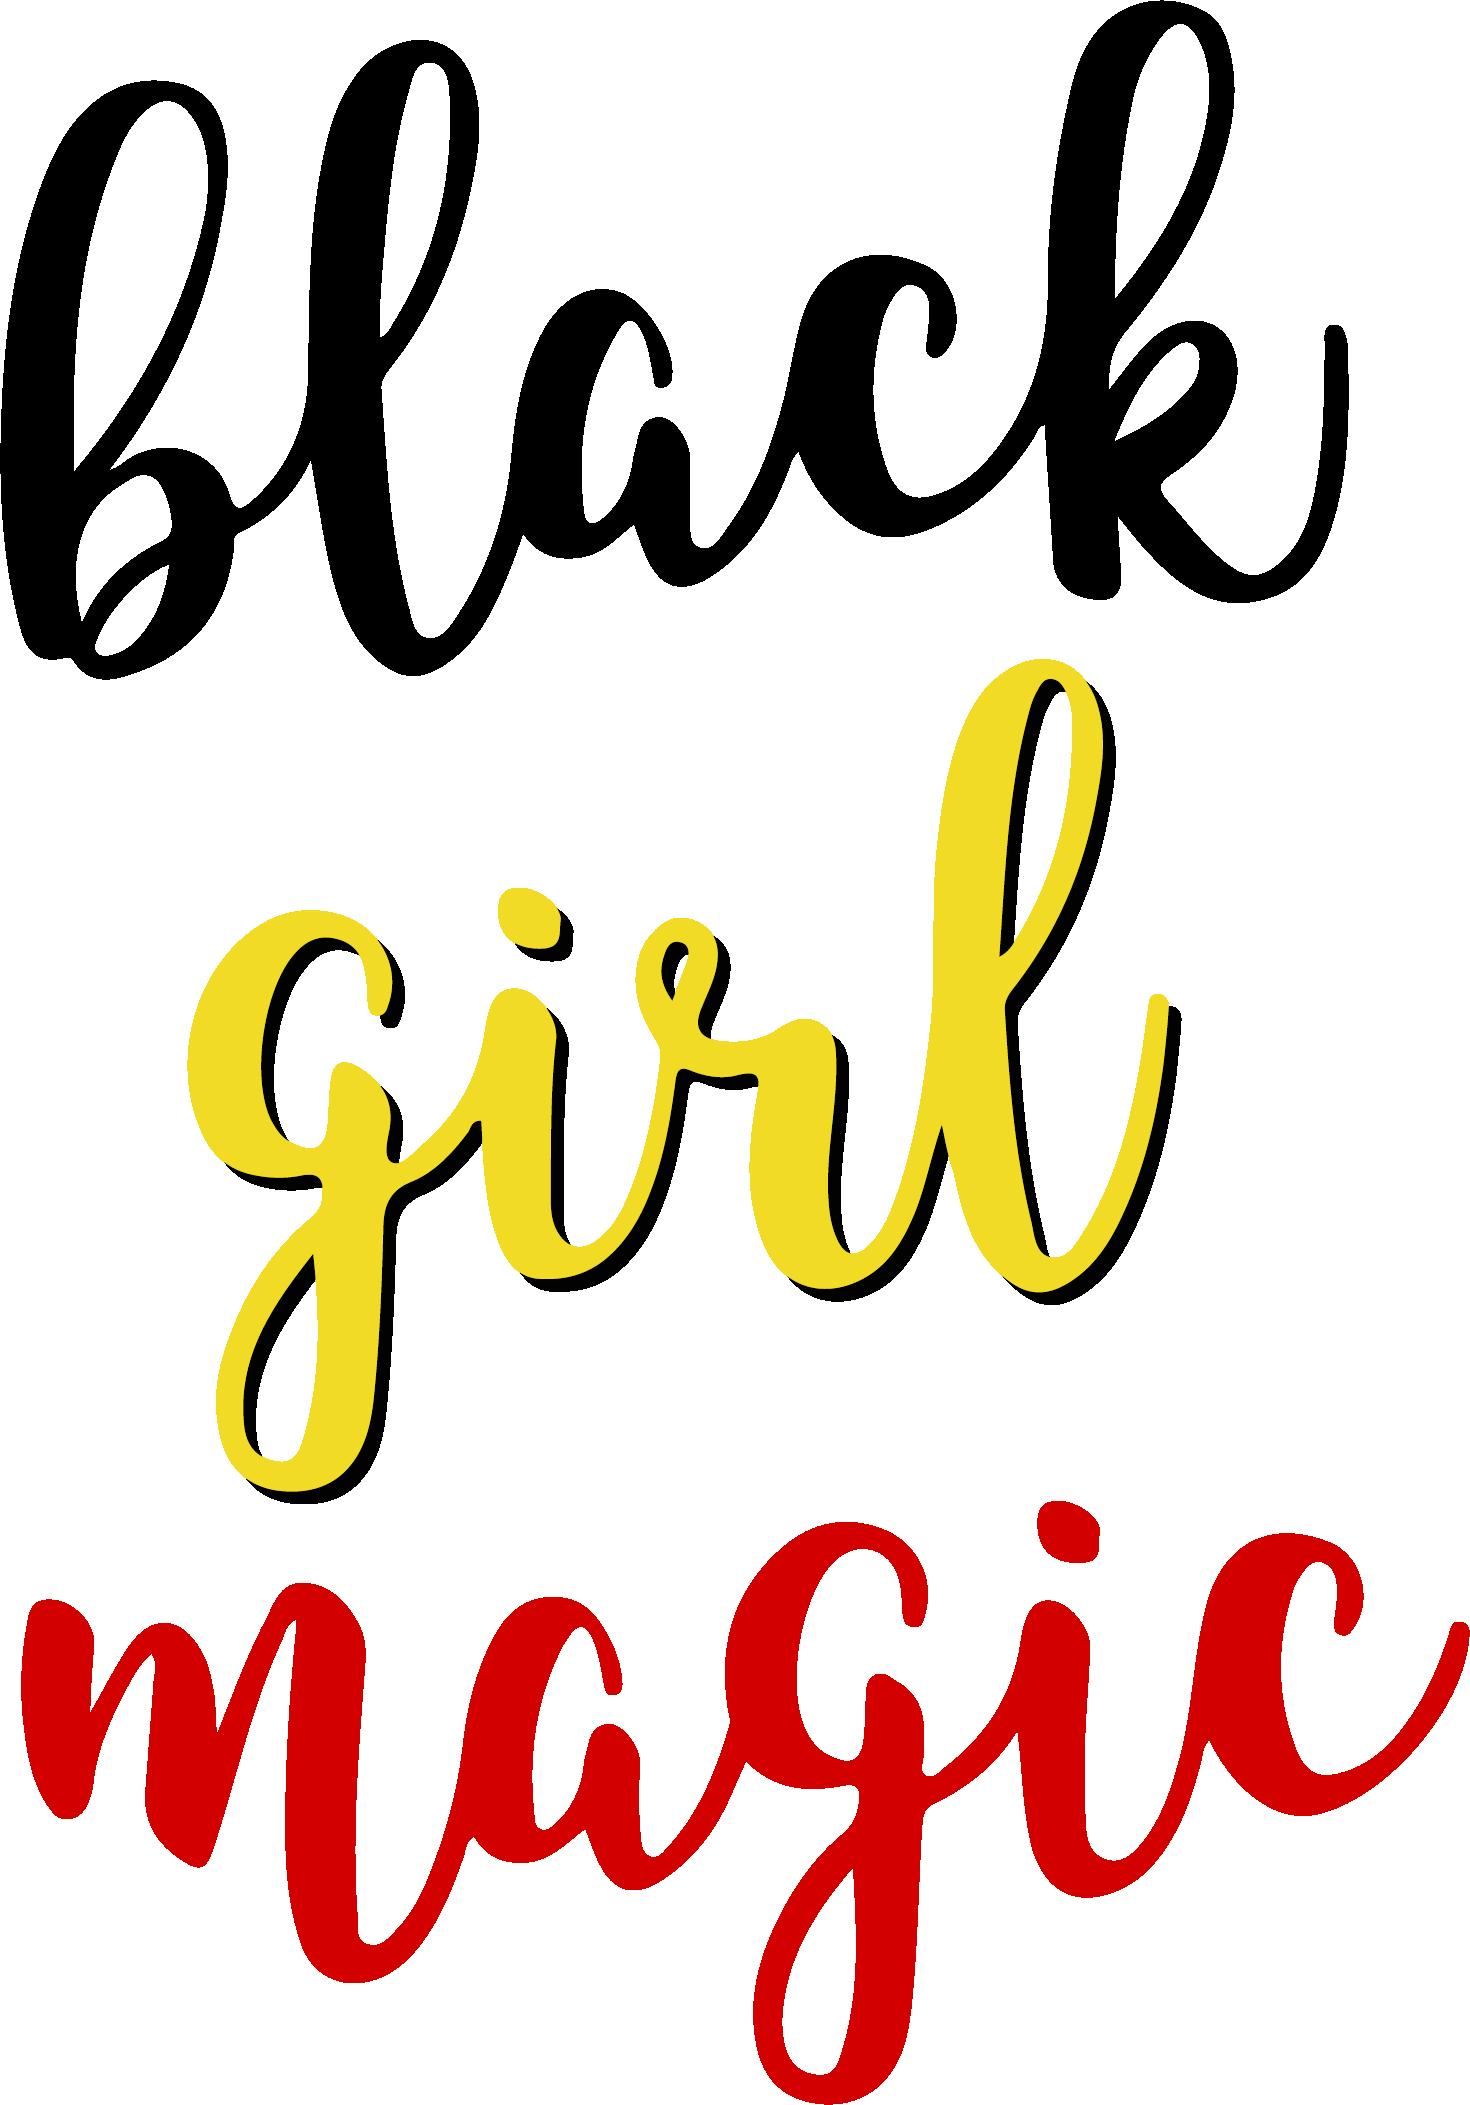 Black girl magic color